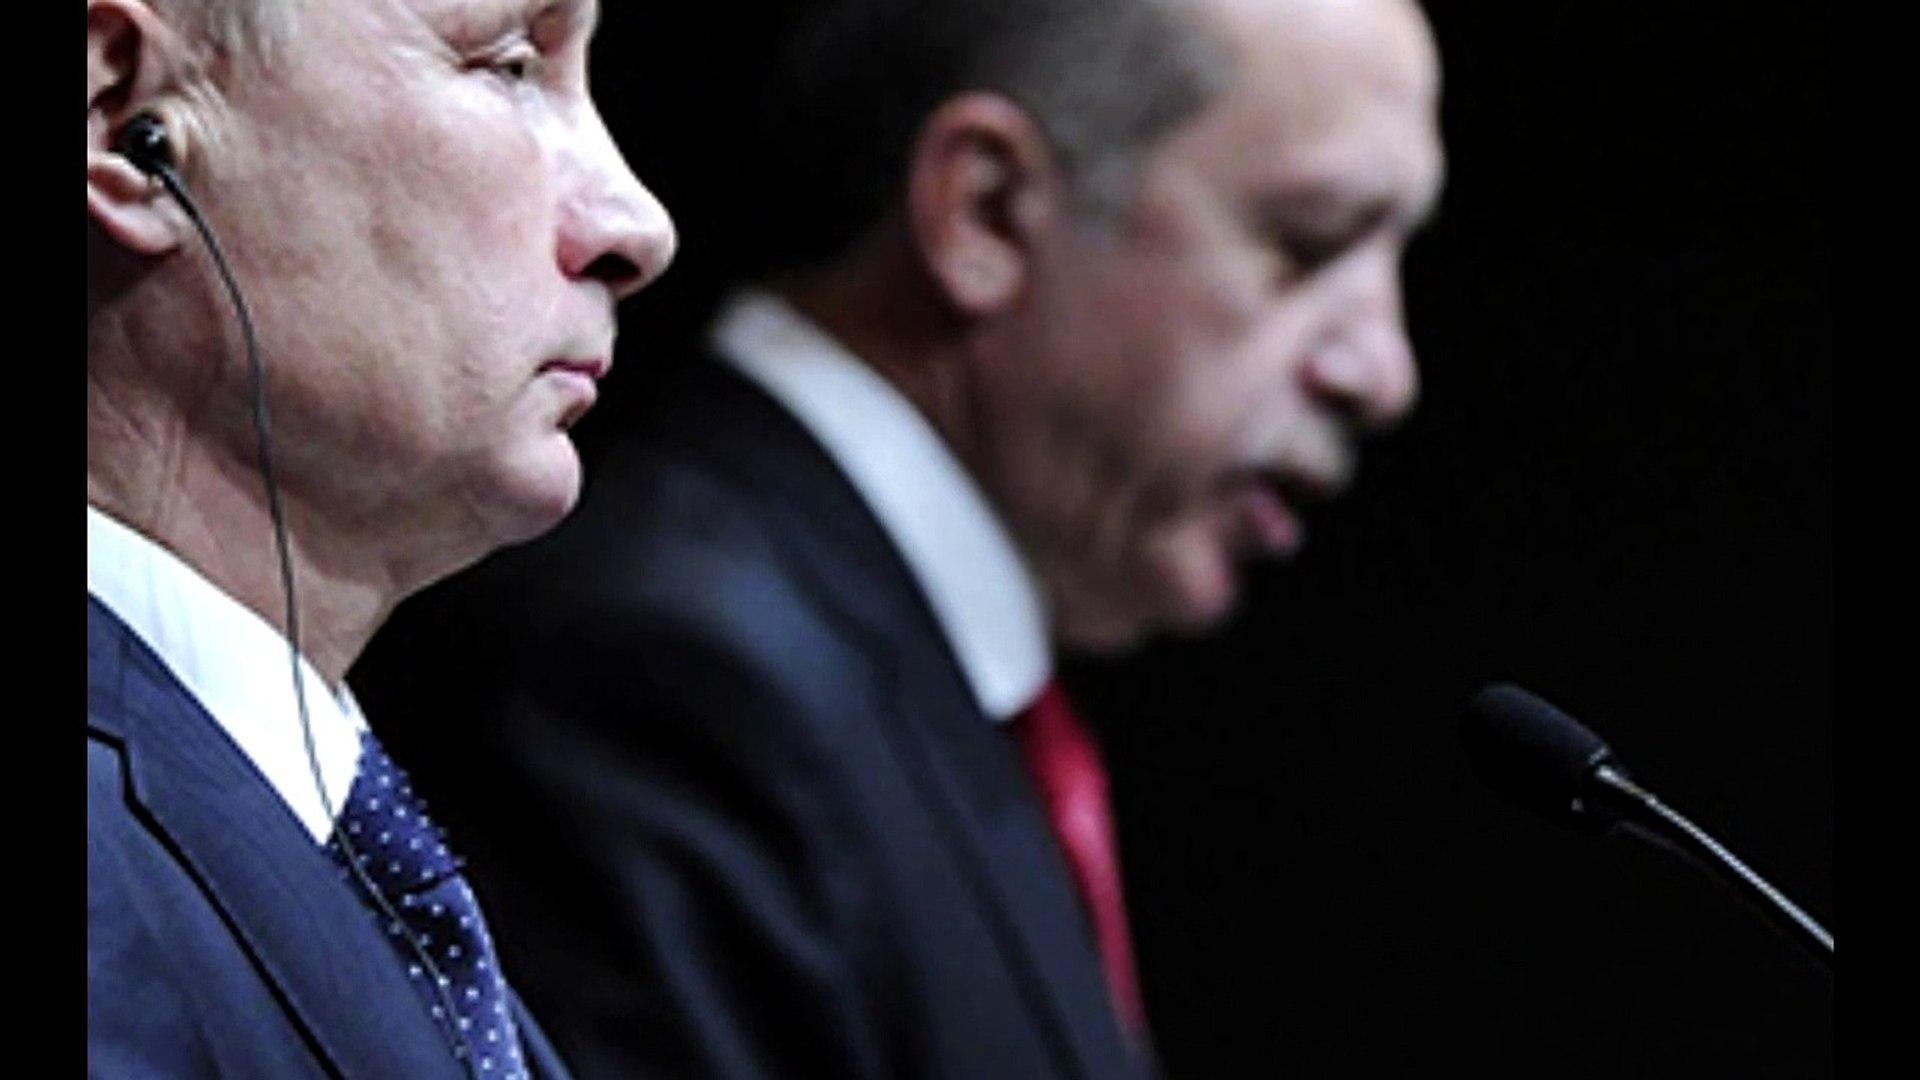 Путину доложили о реакции Эрдогана на его слова о геноциде армян [Full Episode]